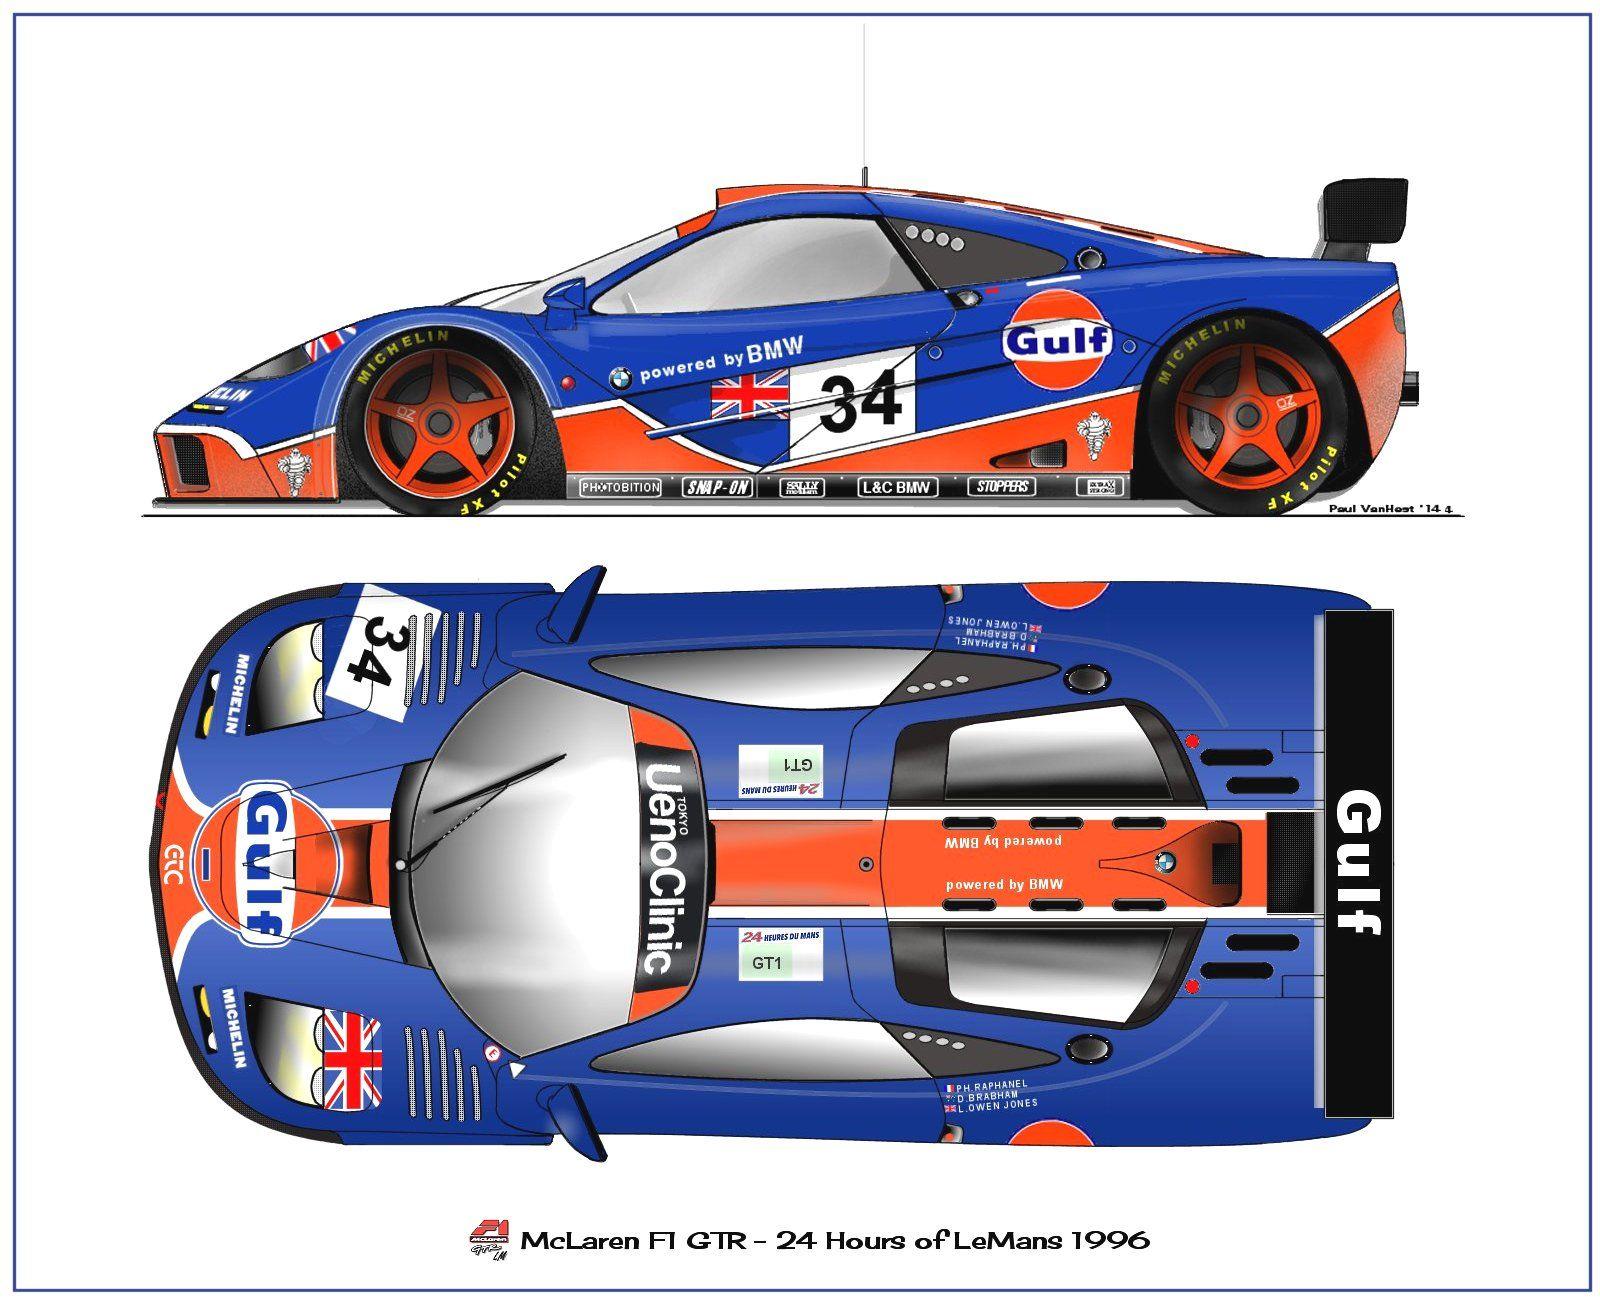 mclaren f1 gtr le mans 1996 motorsports graphic design pinterest mclaren f1 le mans and cars. Black Bedroom Furniture Sets. Home Design Ideas